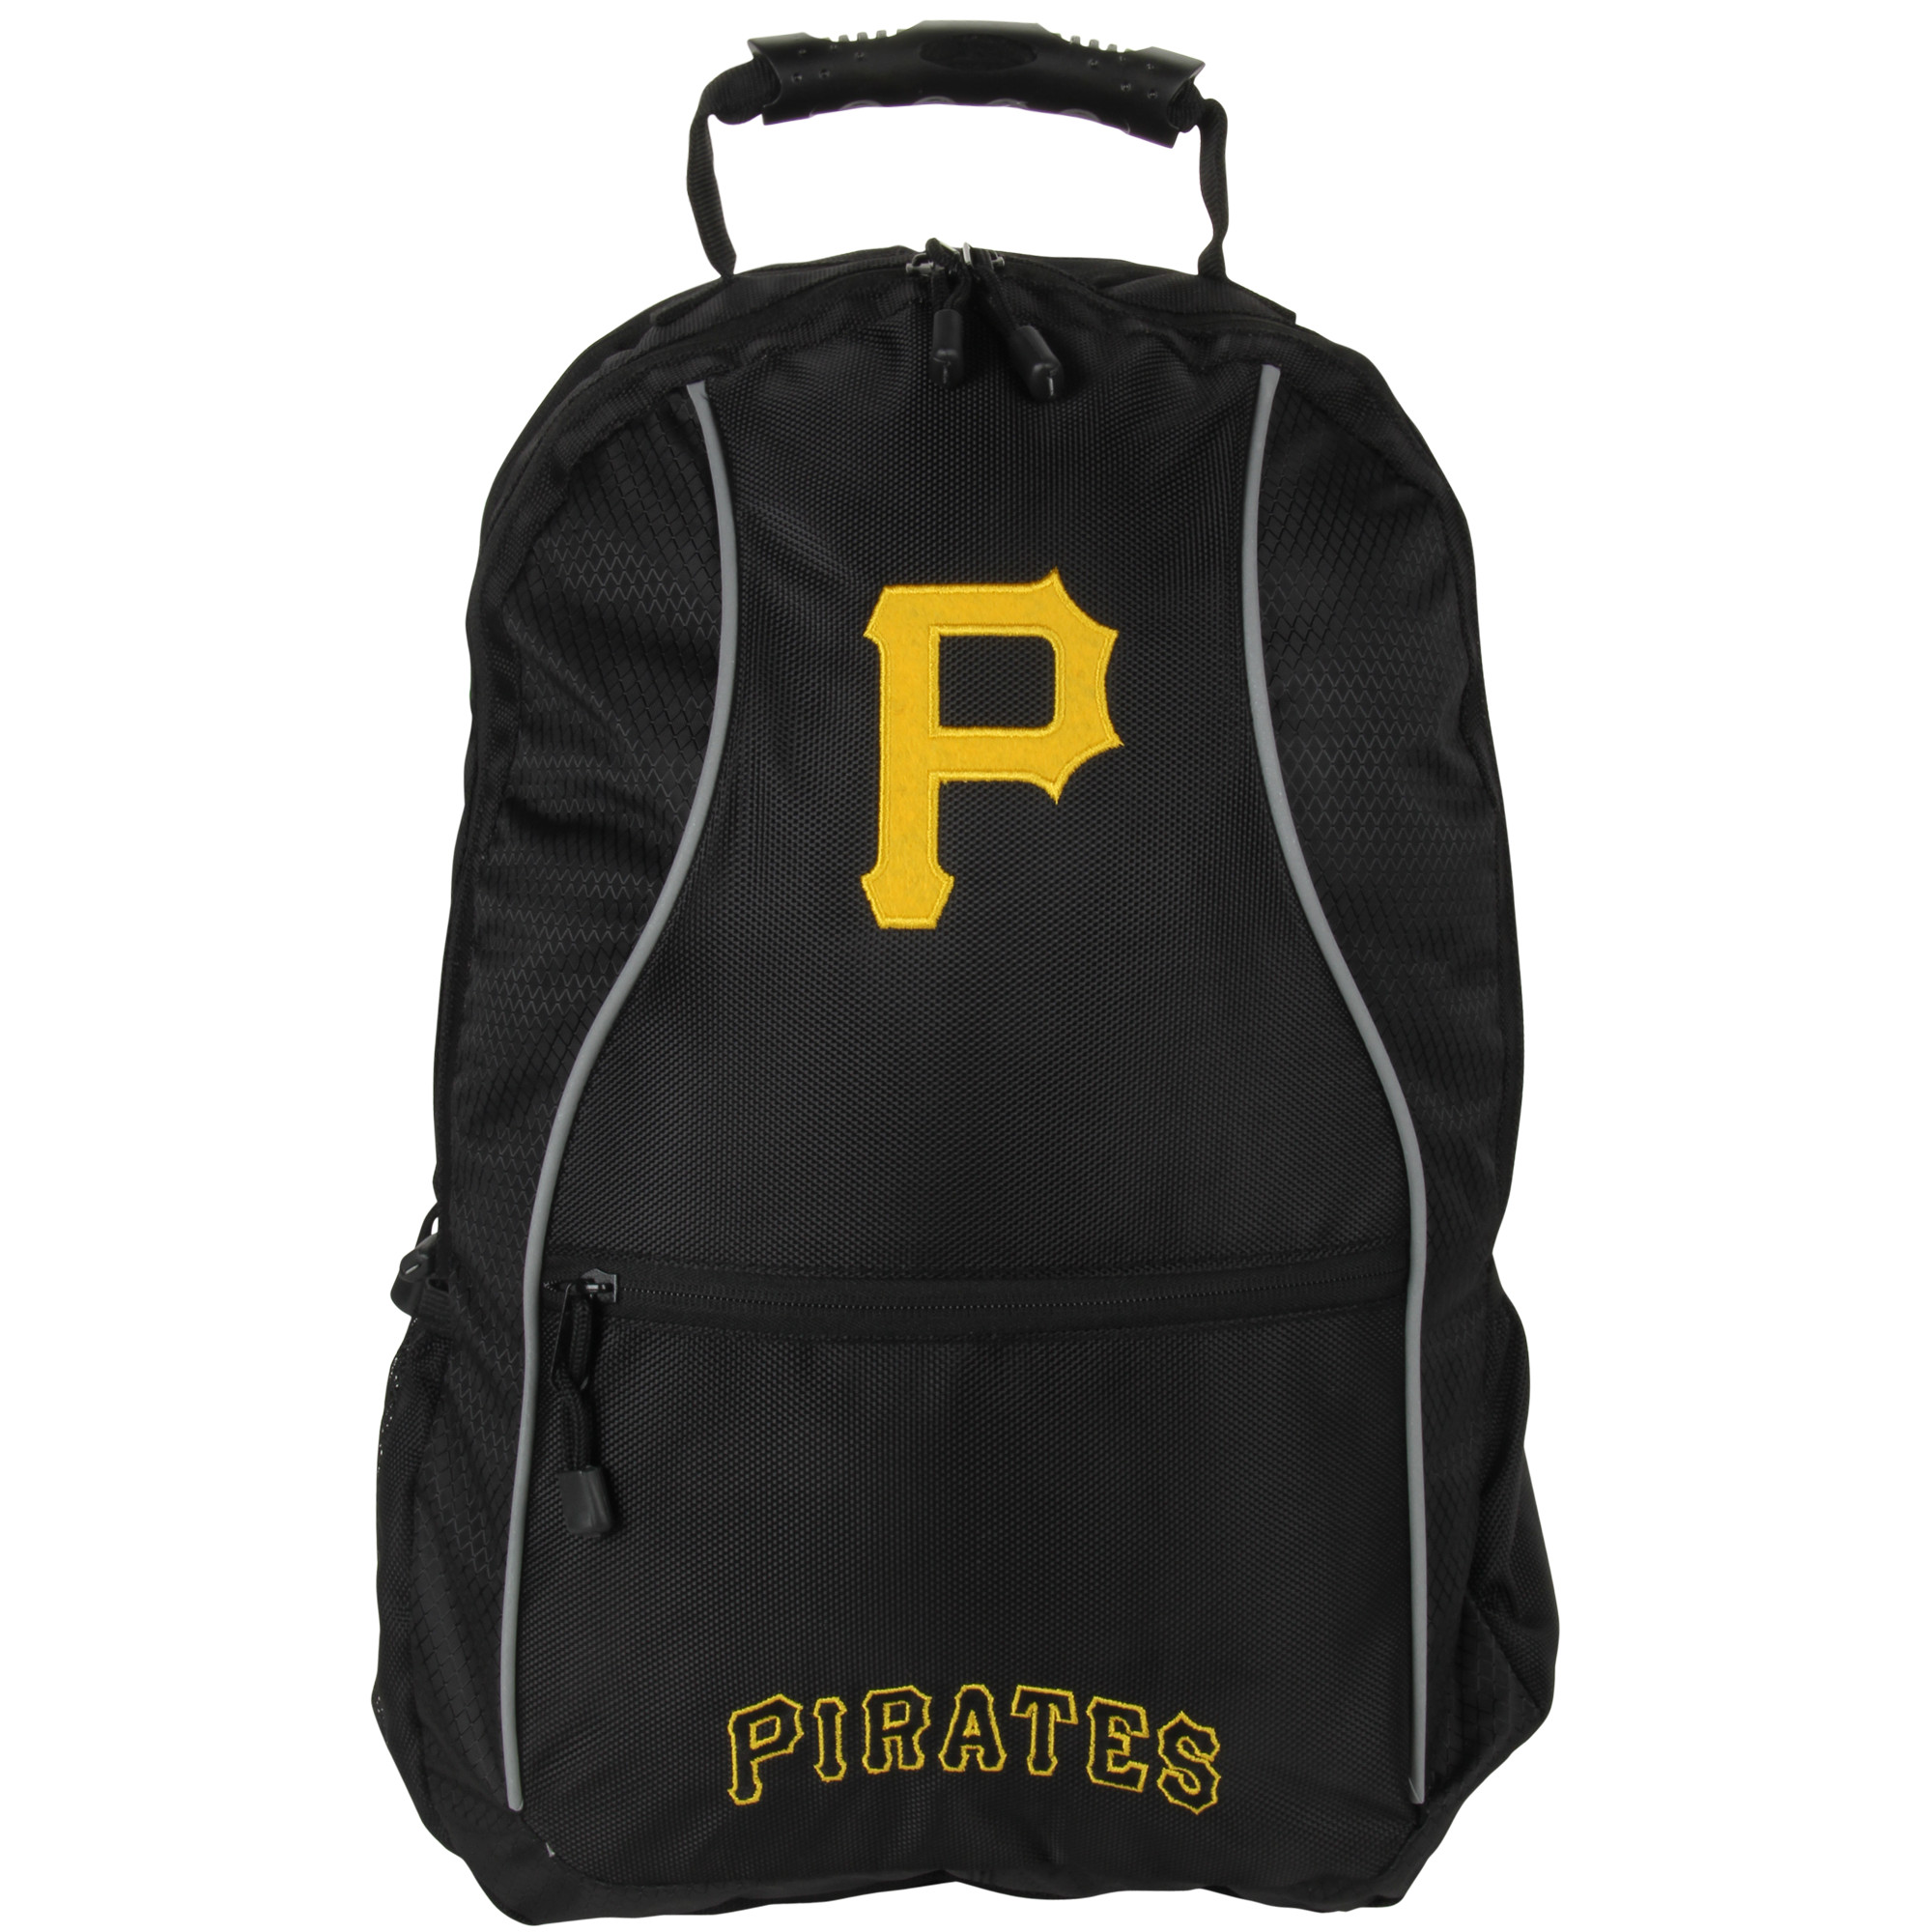 Pittsburgh Pirates The Northwest Company Phenom Backpack - No Size